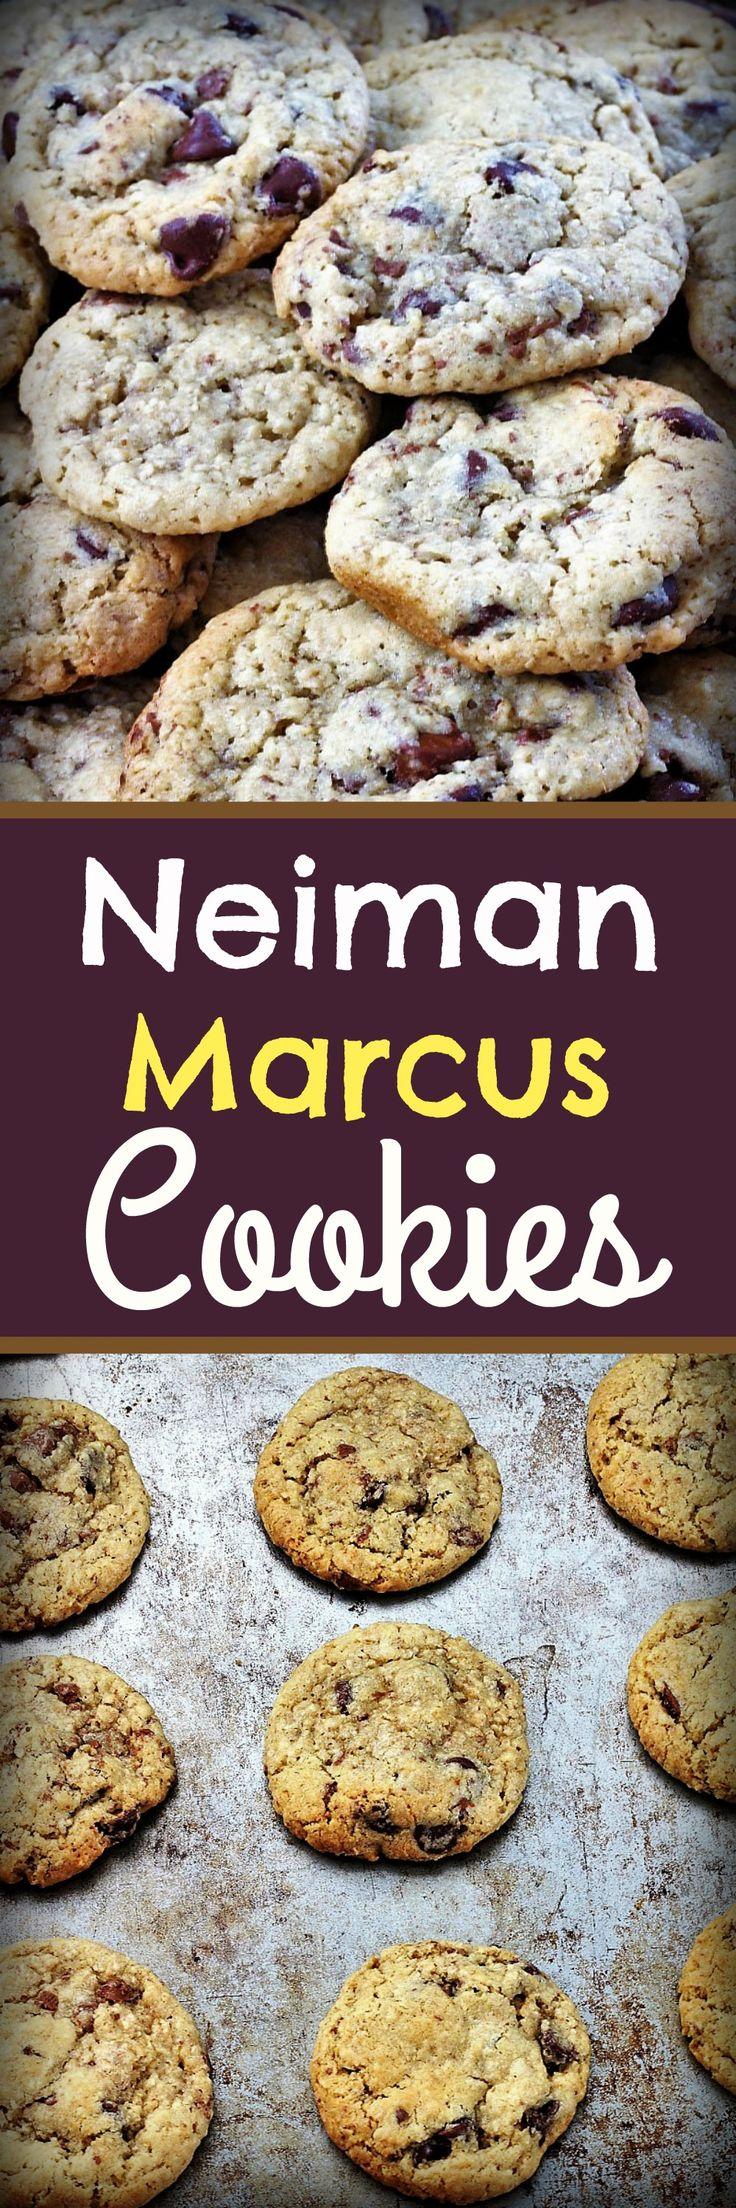 Neiman Marcus Cookies, Recipe Treasures